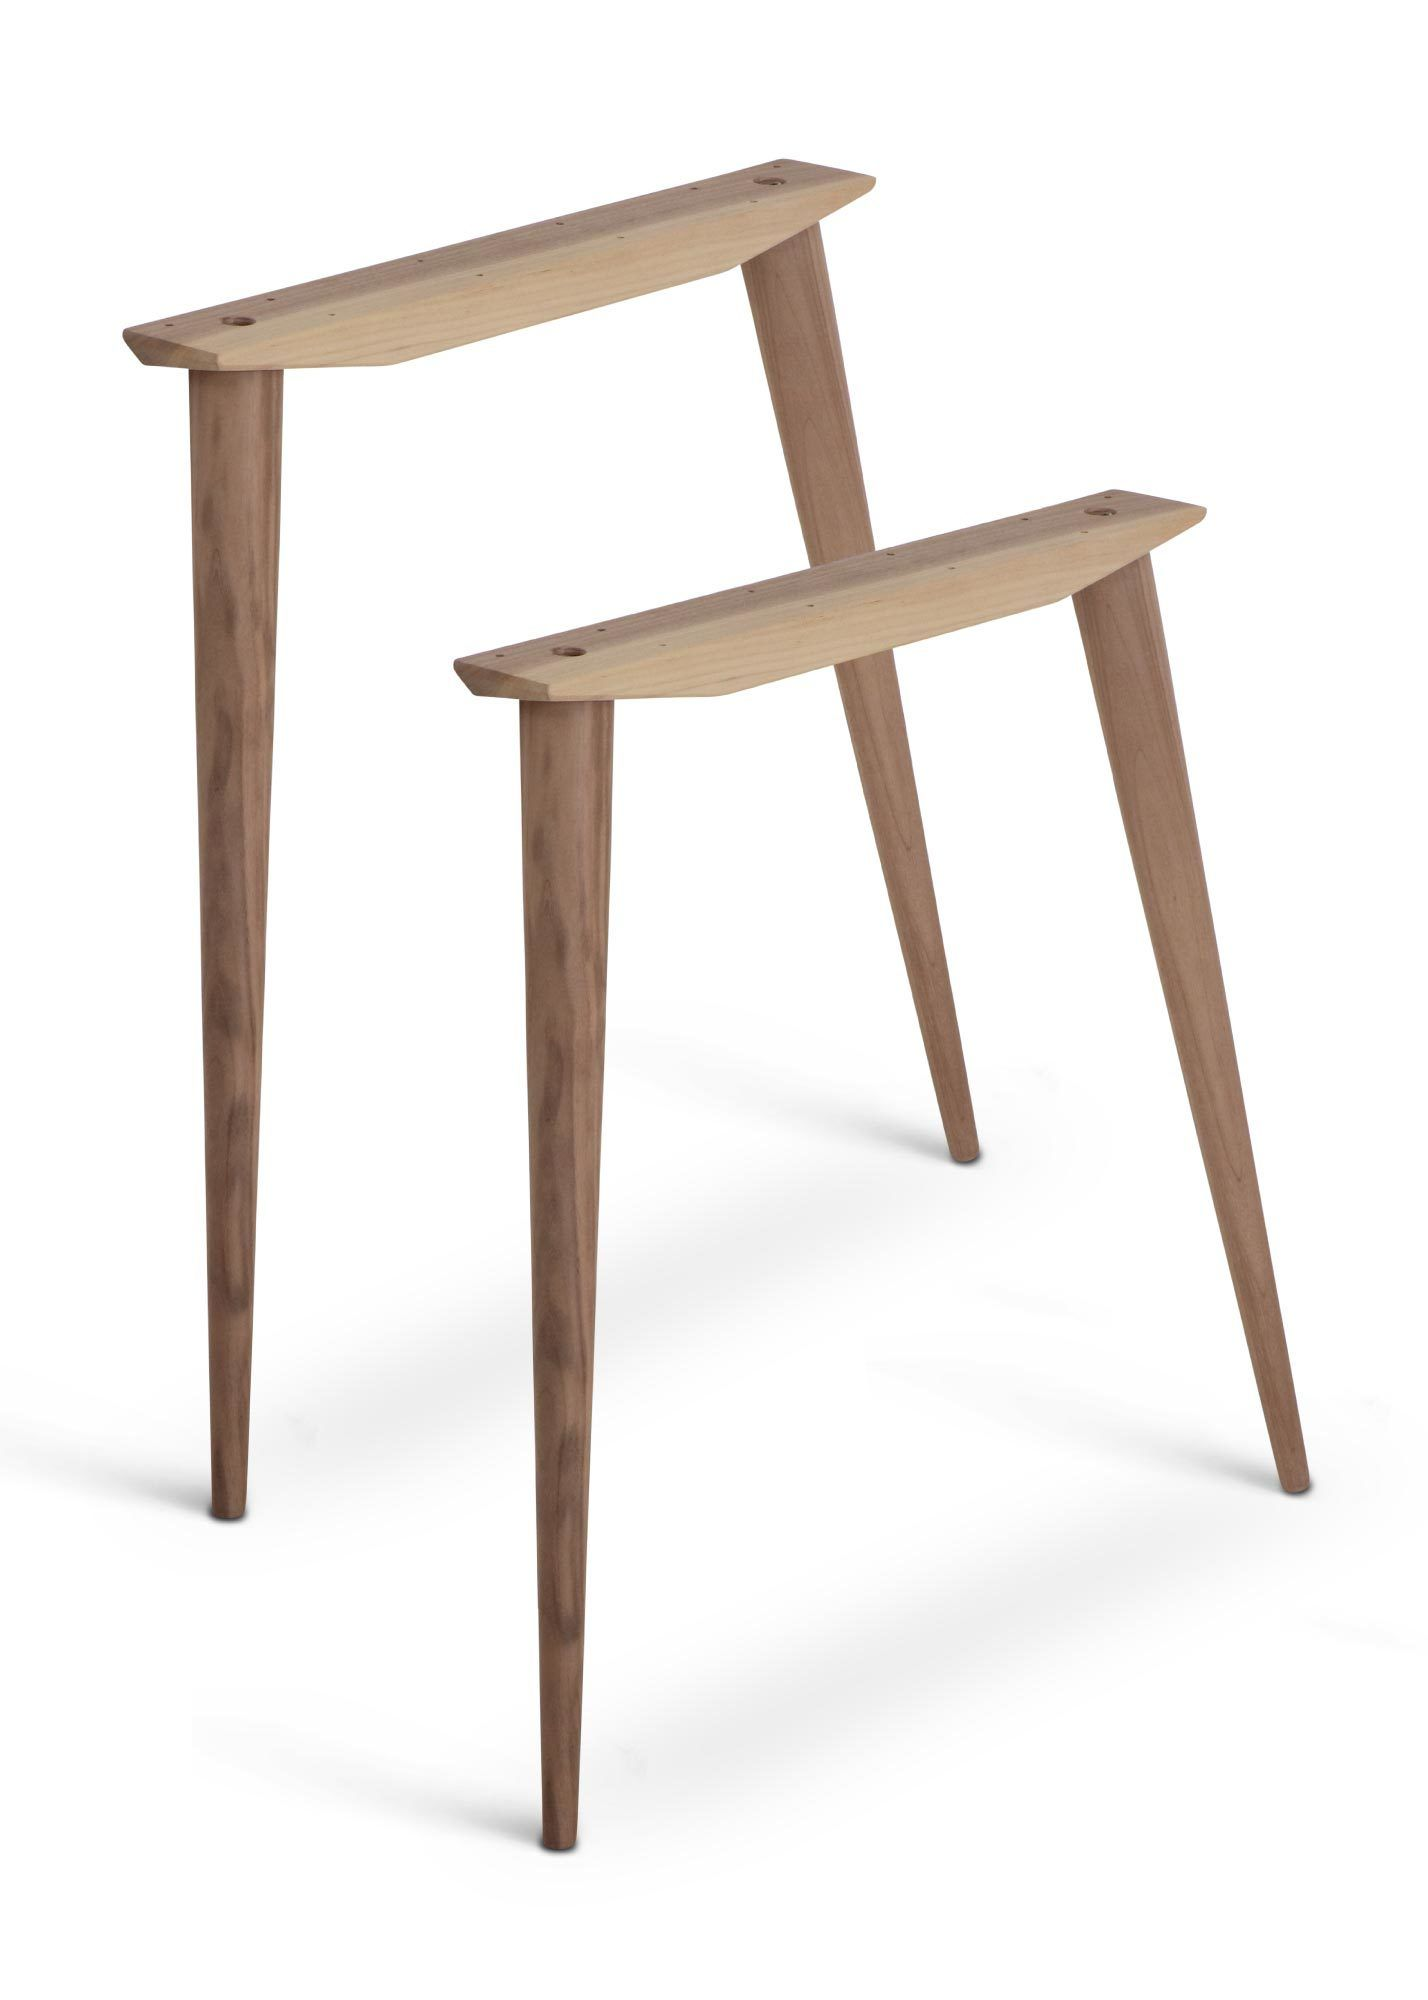 Mccobb Mid Century Modern Table Base Set 4 Legs 2 Angled Cleats